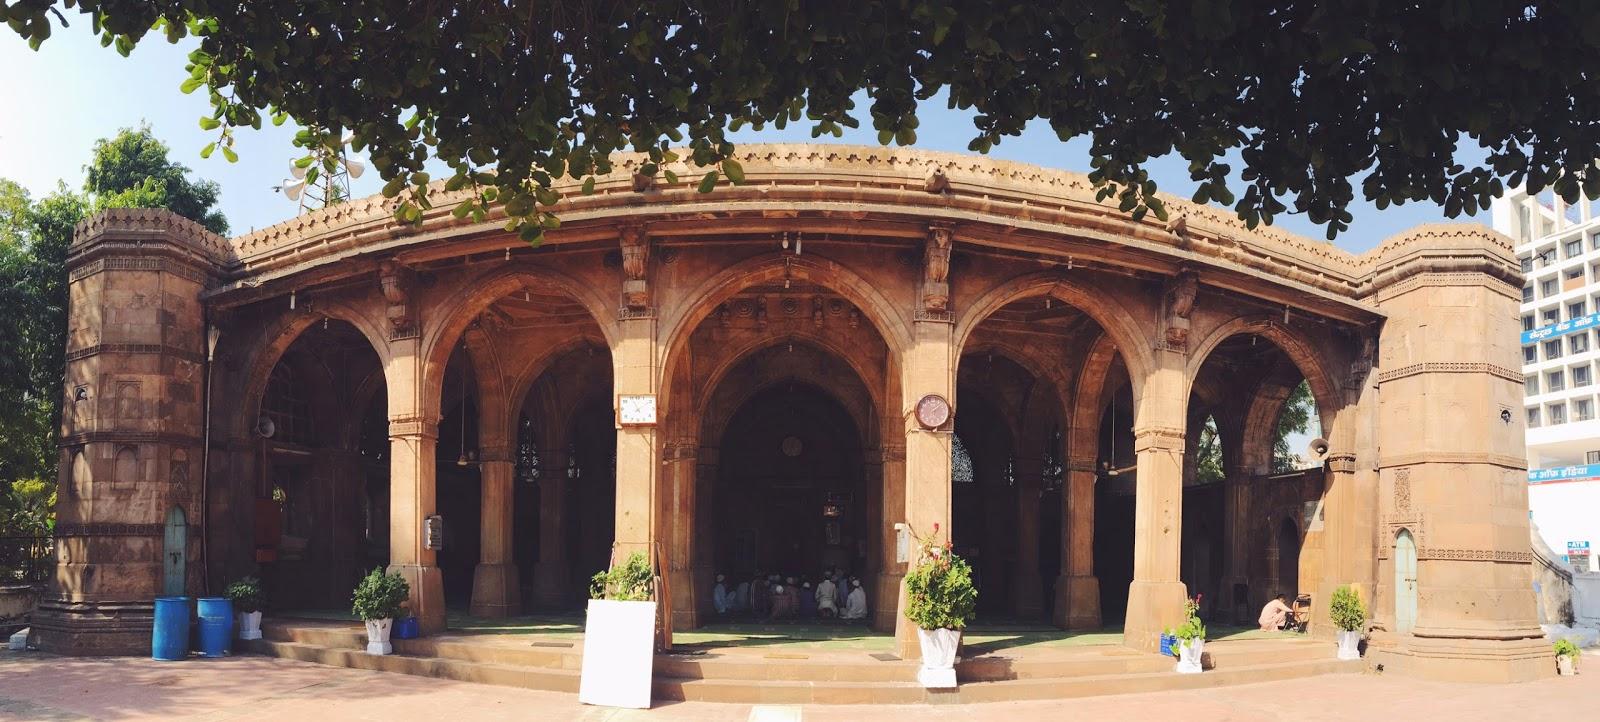 Sidi Saiyyed Mosque Ahmedabad panorama sayed sayeed masjid islam muslim